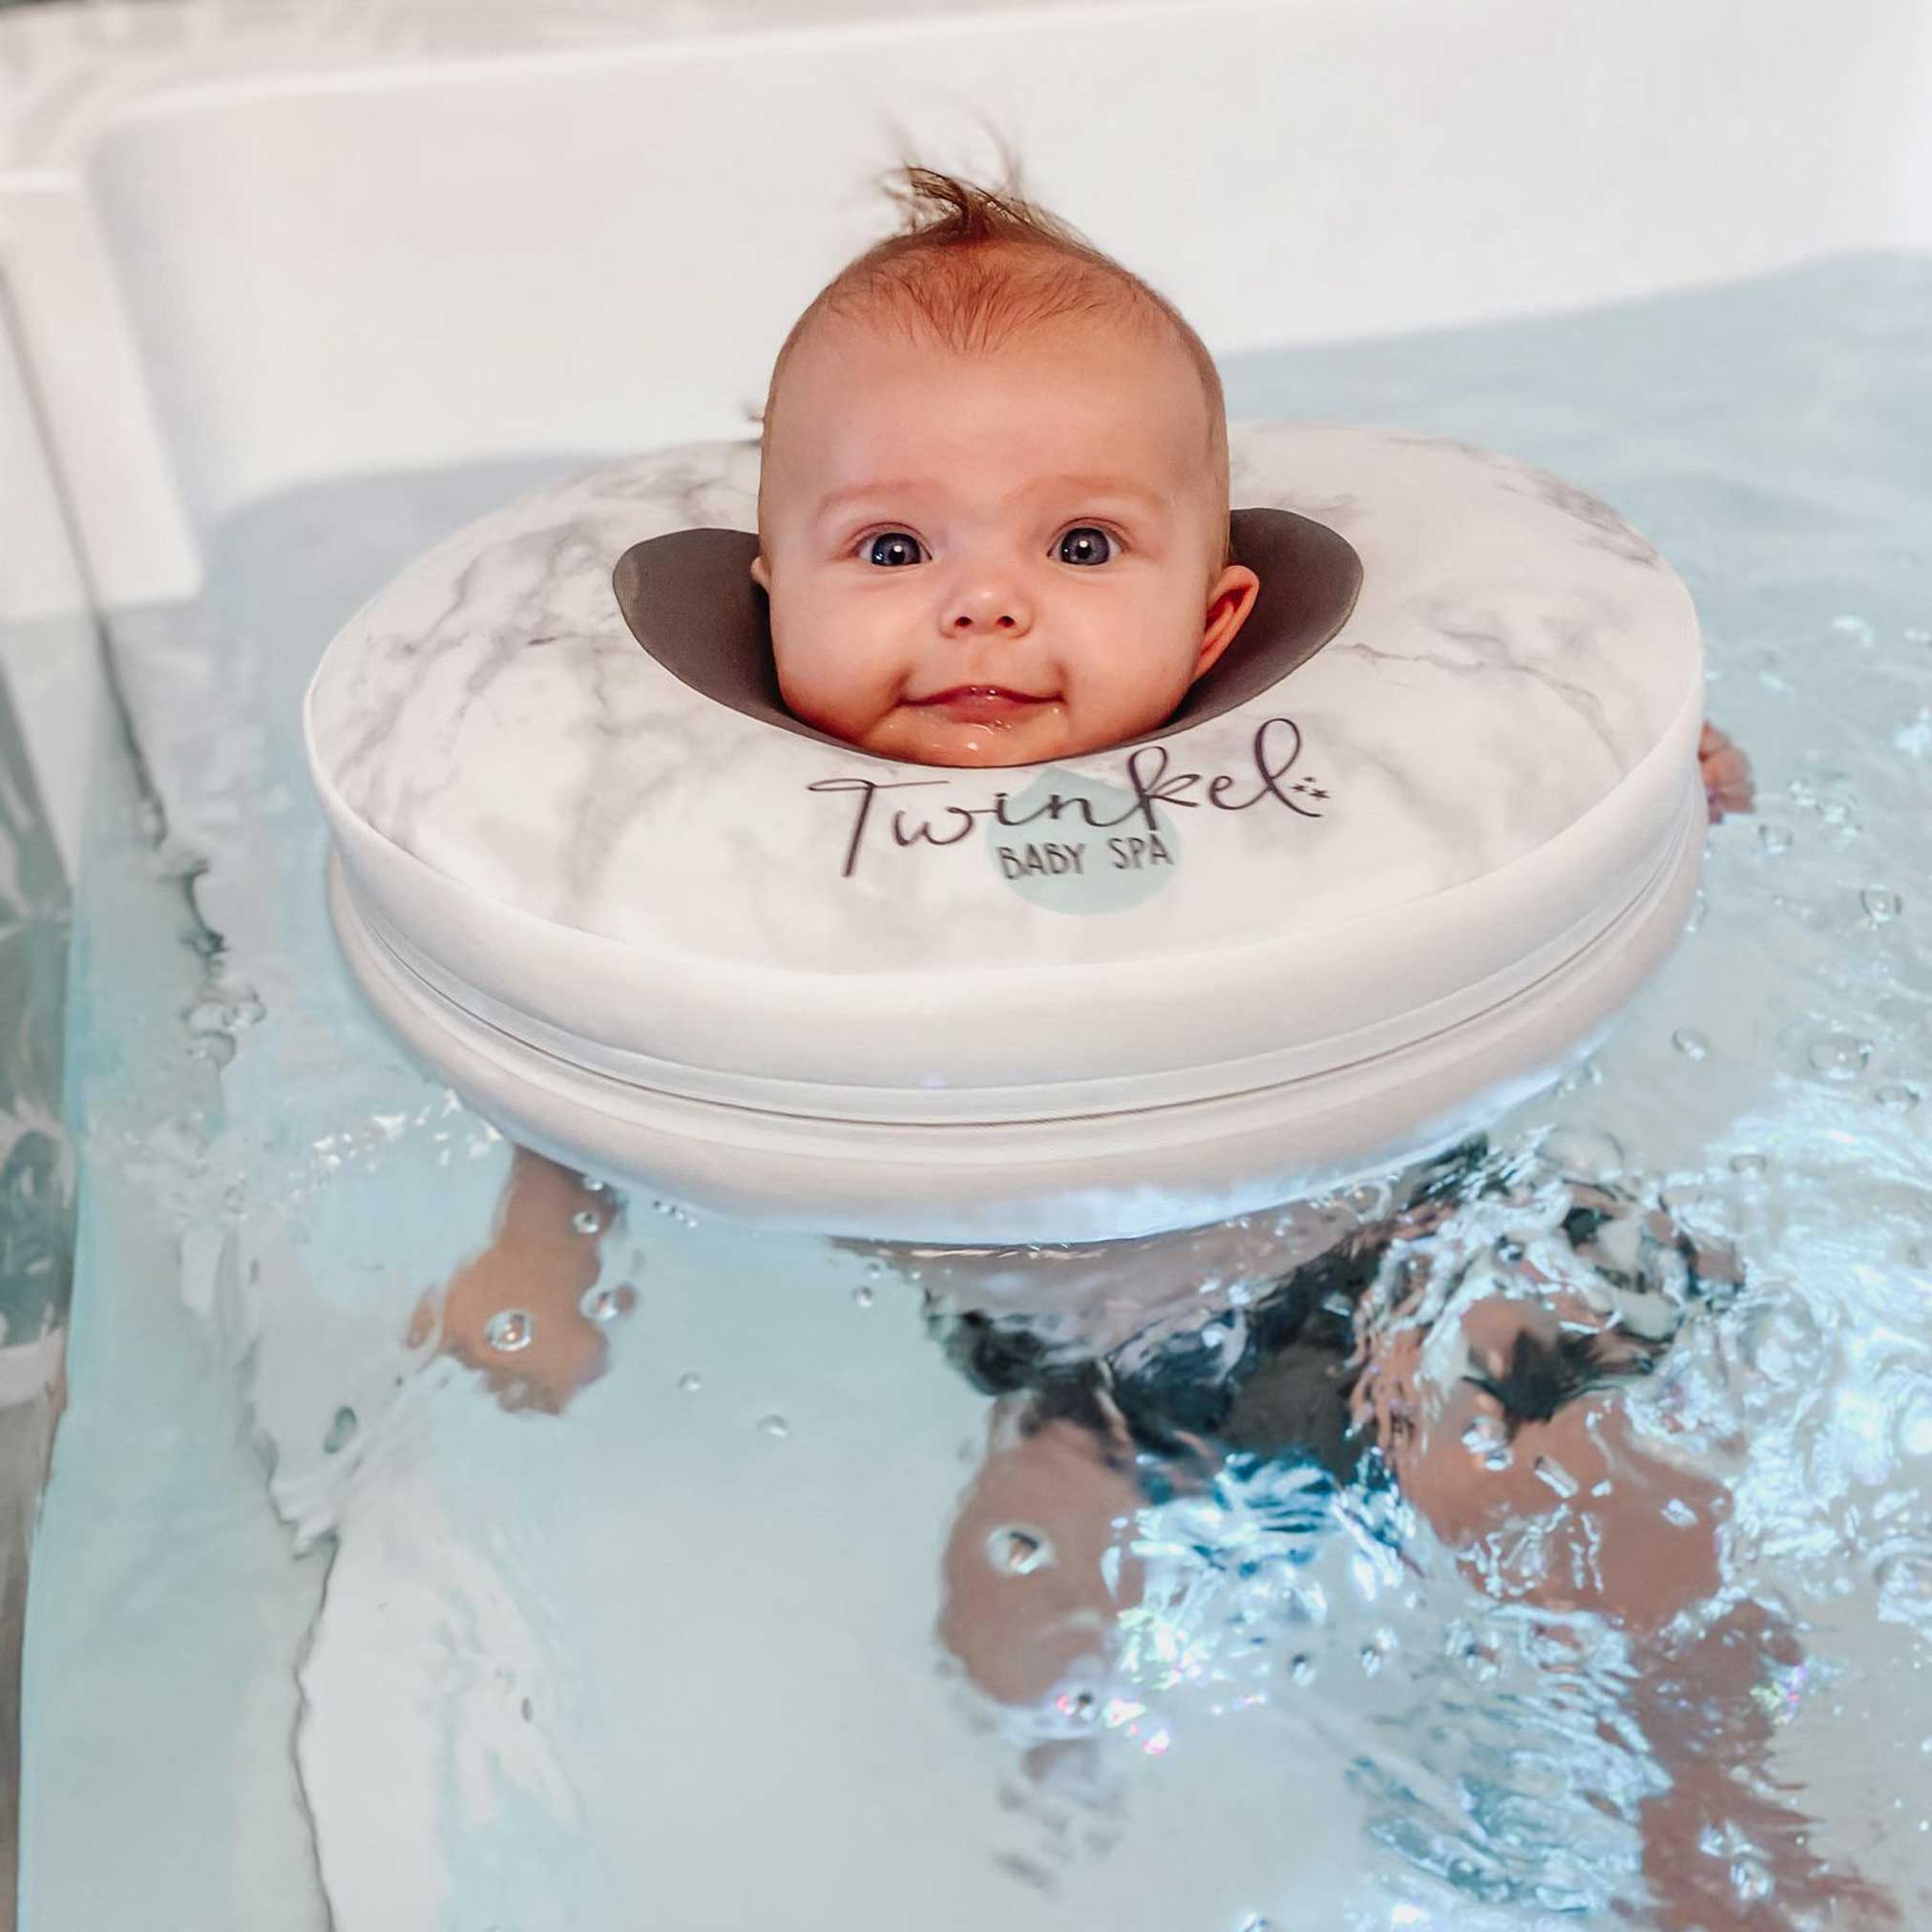 twinkel-baby-spa-aanbod